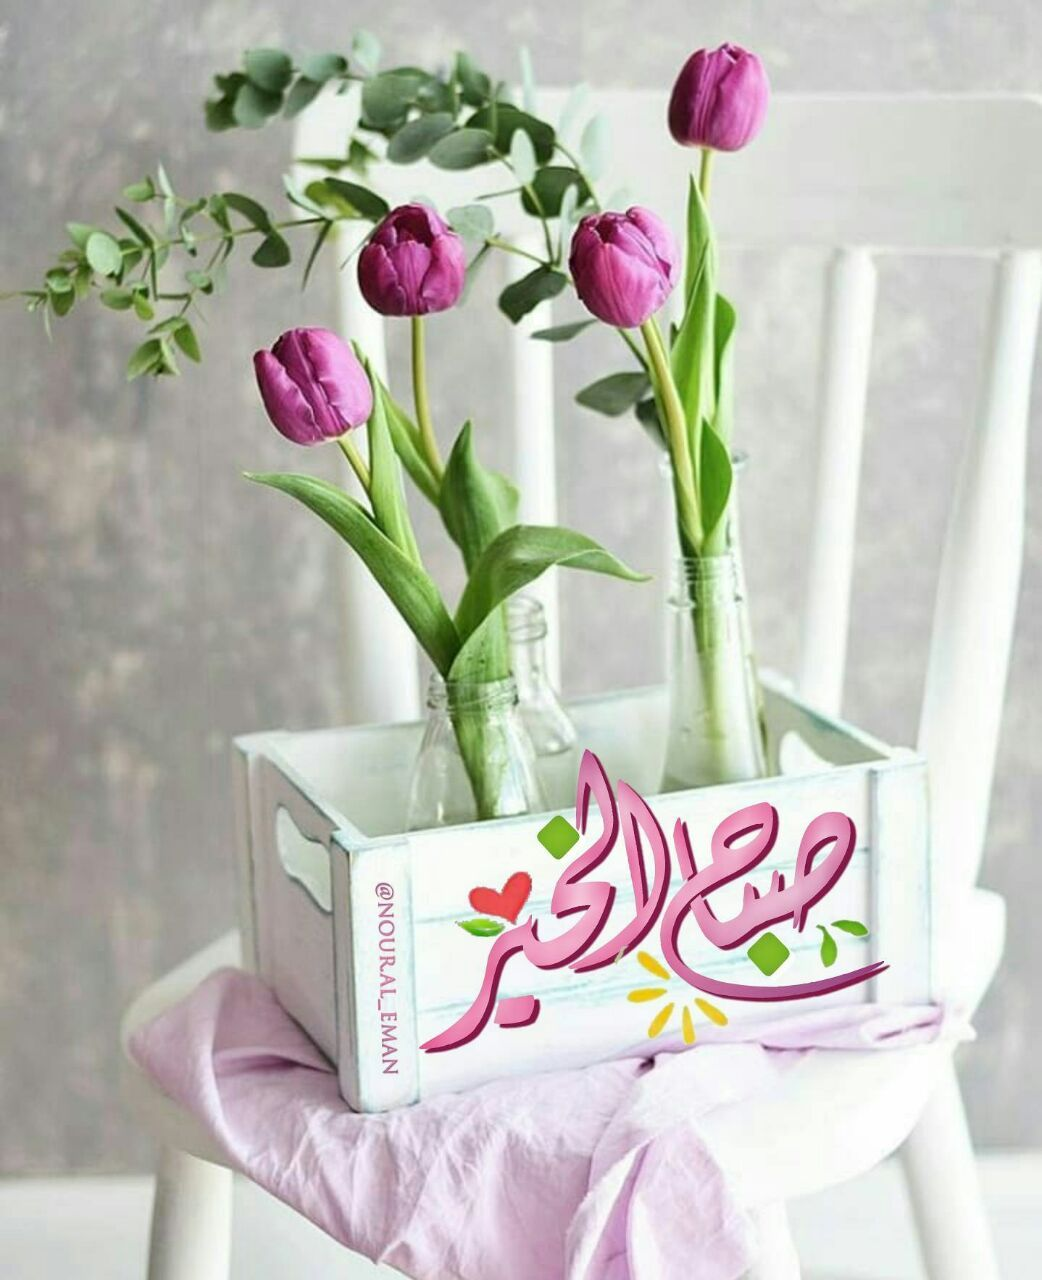 Pin By Rasha A Hamid On صباح الخير Good Morning Good Morning Morning Images Beautiful Morning